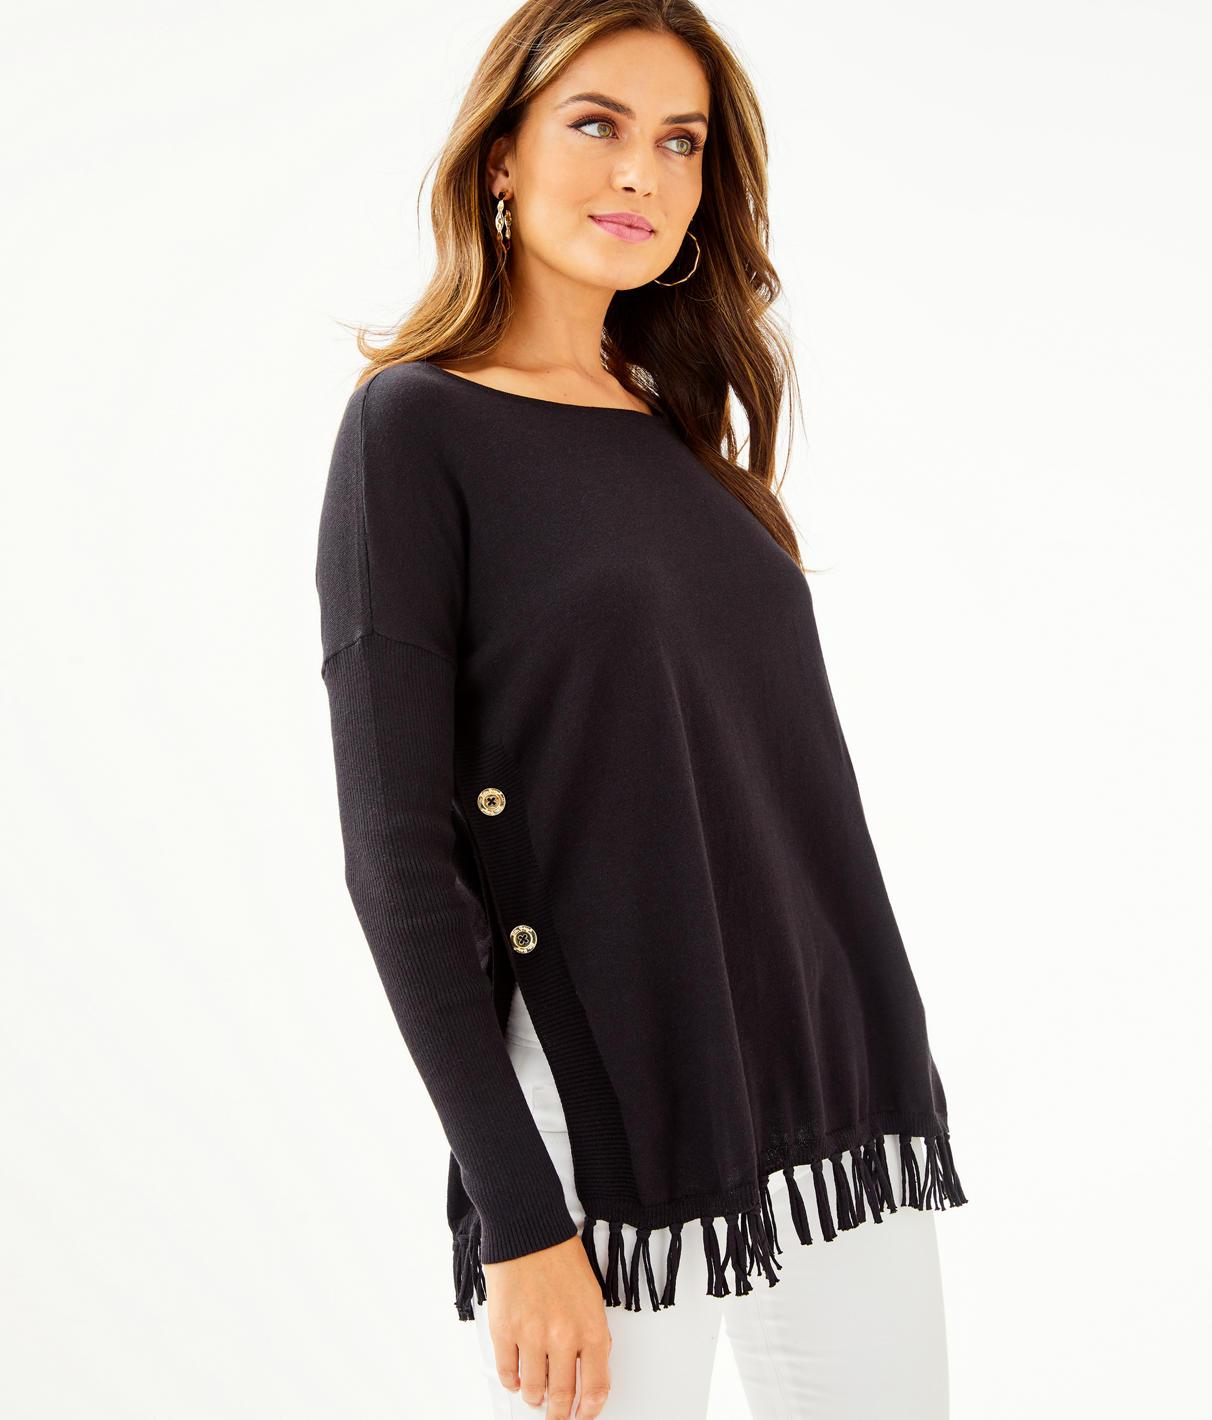 Lilly Pulitzer Lilly Pulitzer Womens Ramona Sweater